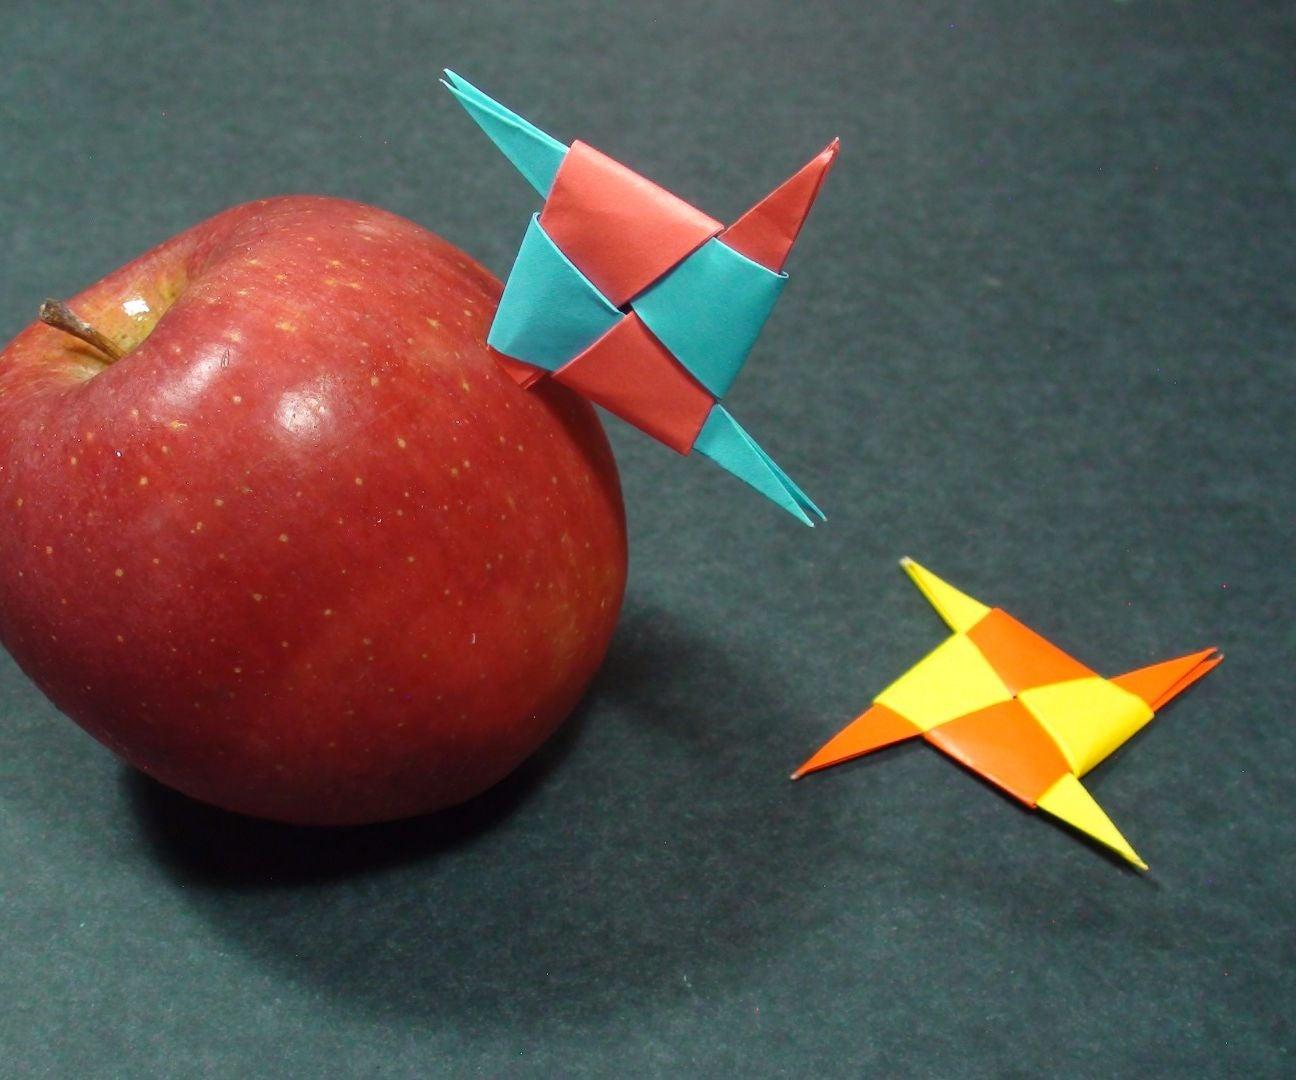 How To Make a Paper Ninja Star (Shuriken) - Origami - YouTube | 1080x1296